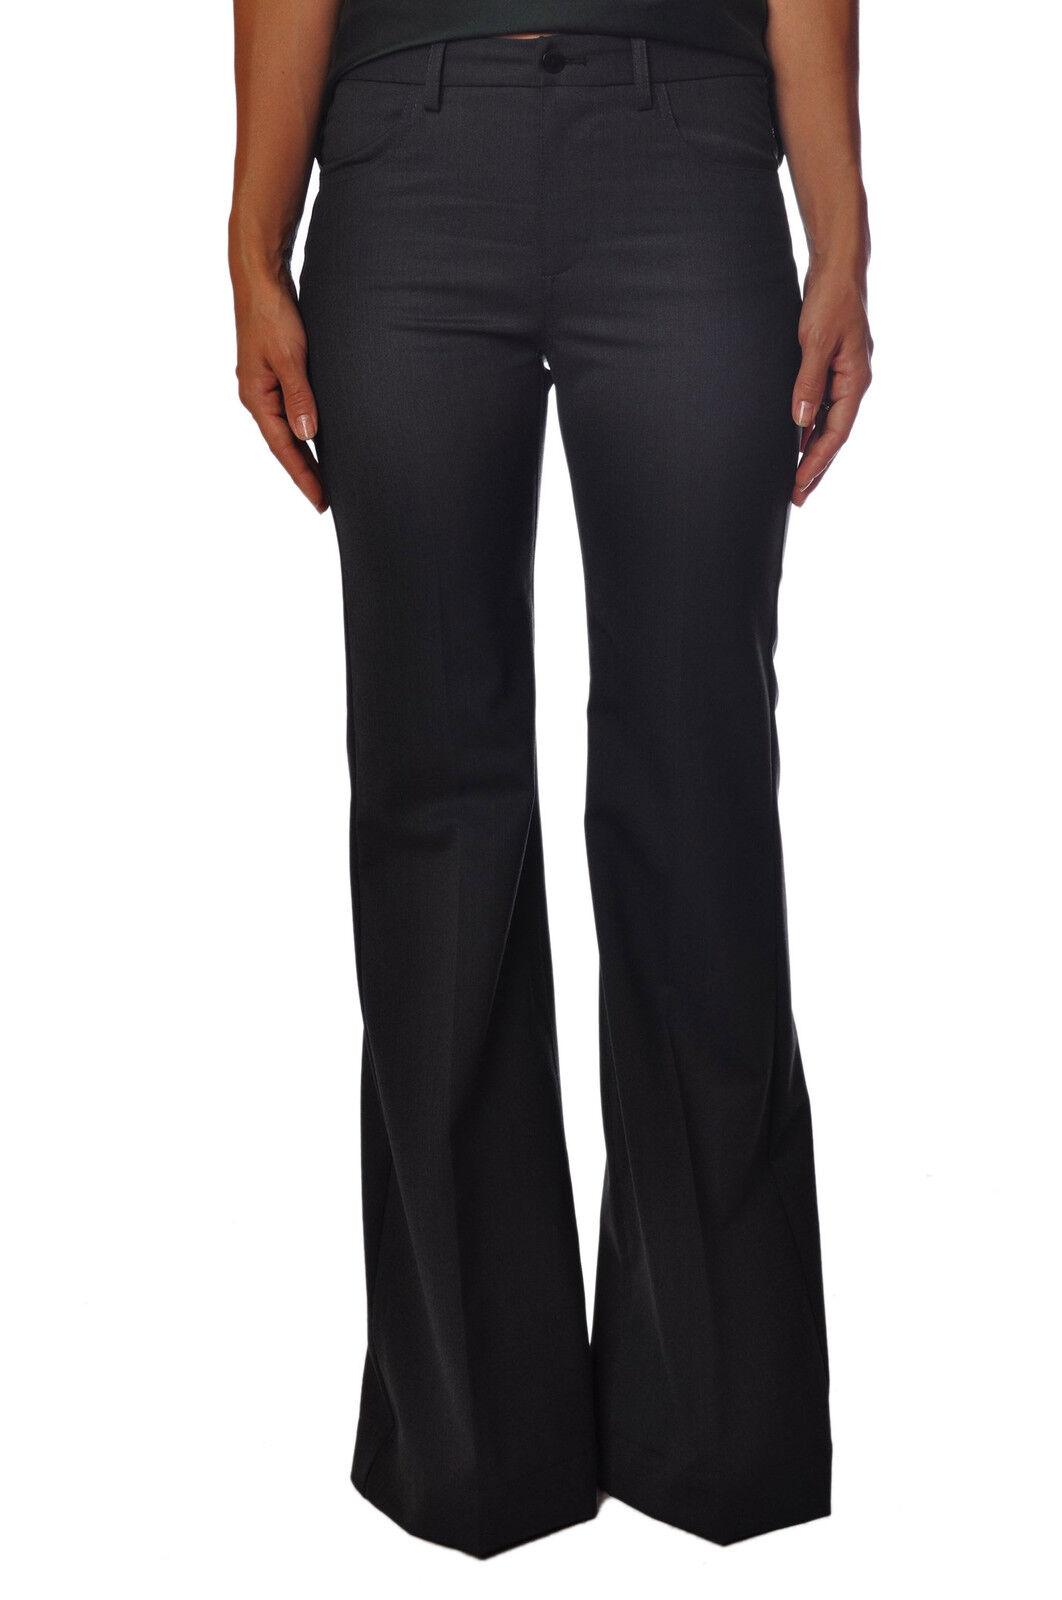 Merci  -  Pants - Female - Grey - 104624A184913